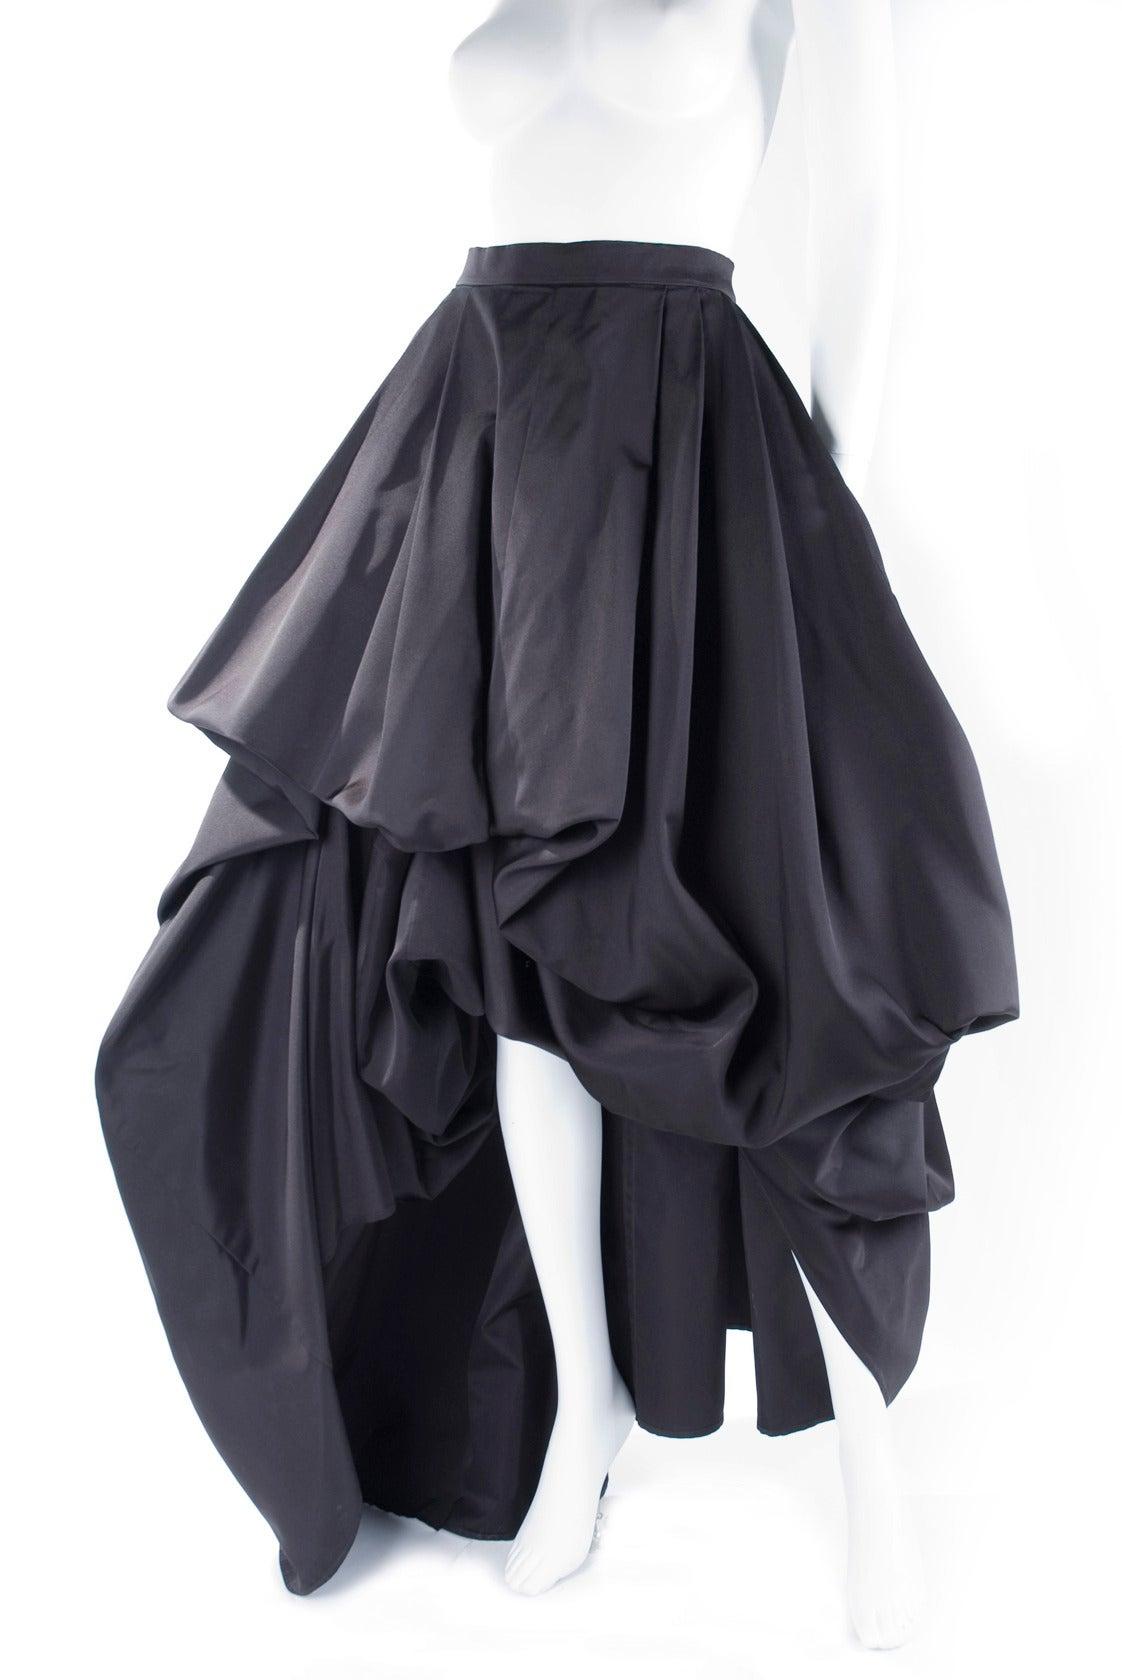 Rare Vintage HERMES Asymetrical Evening Skirt in Black Silk 5